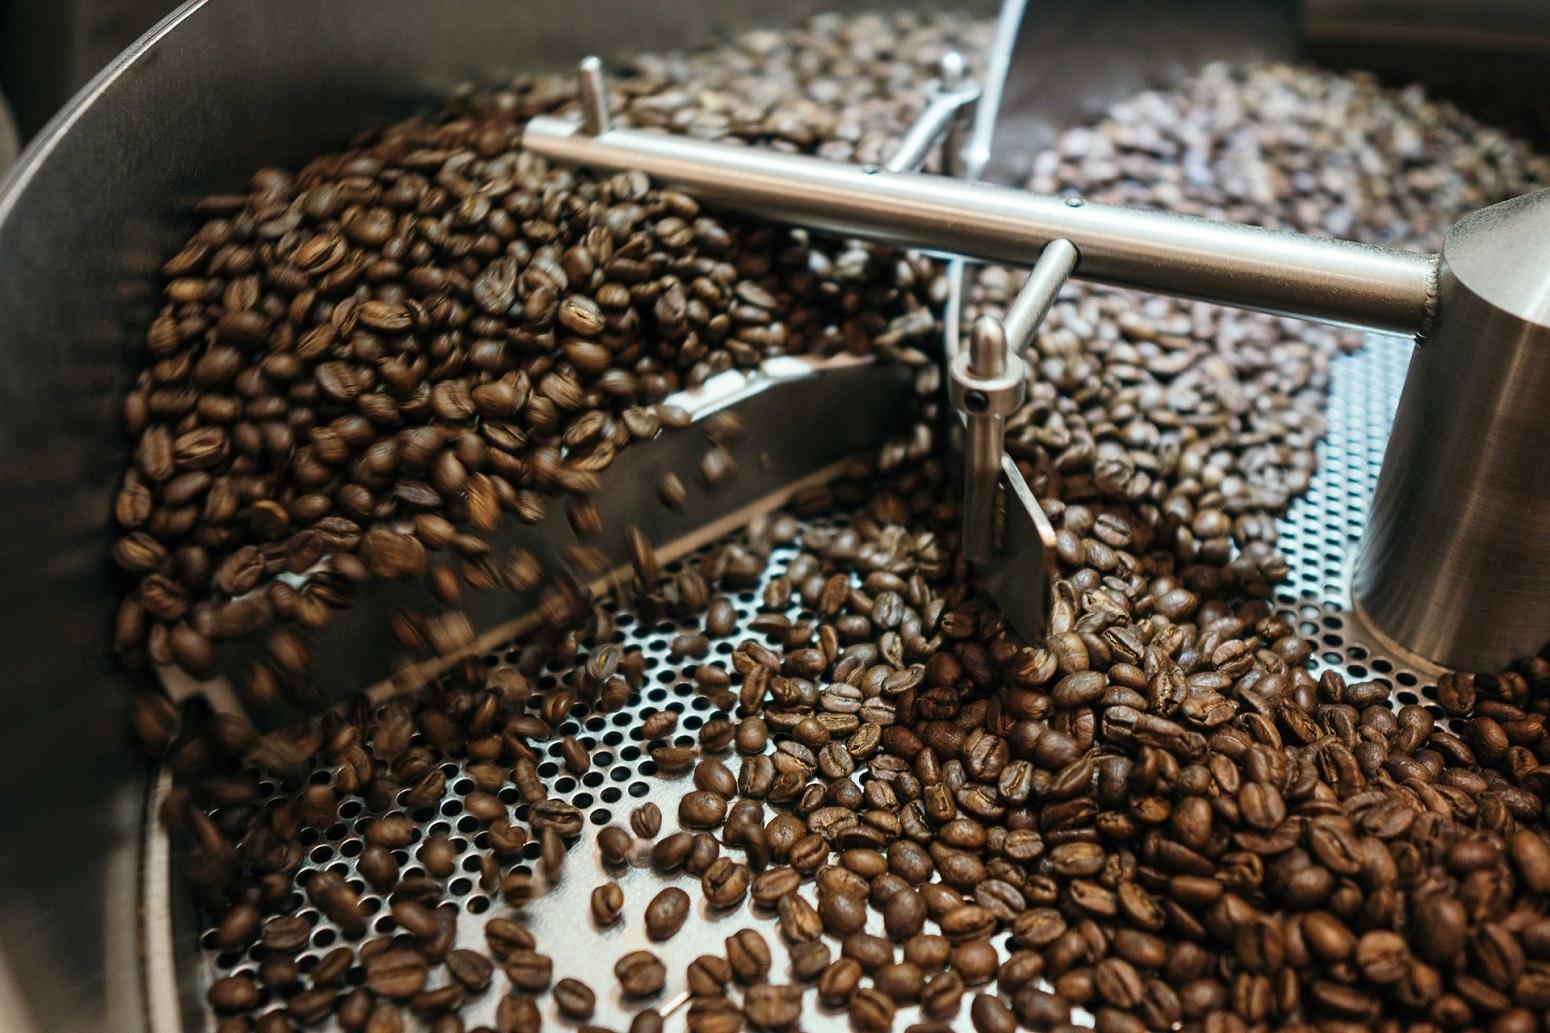 20201117-2014-3-kafijas-pupinas.jpg